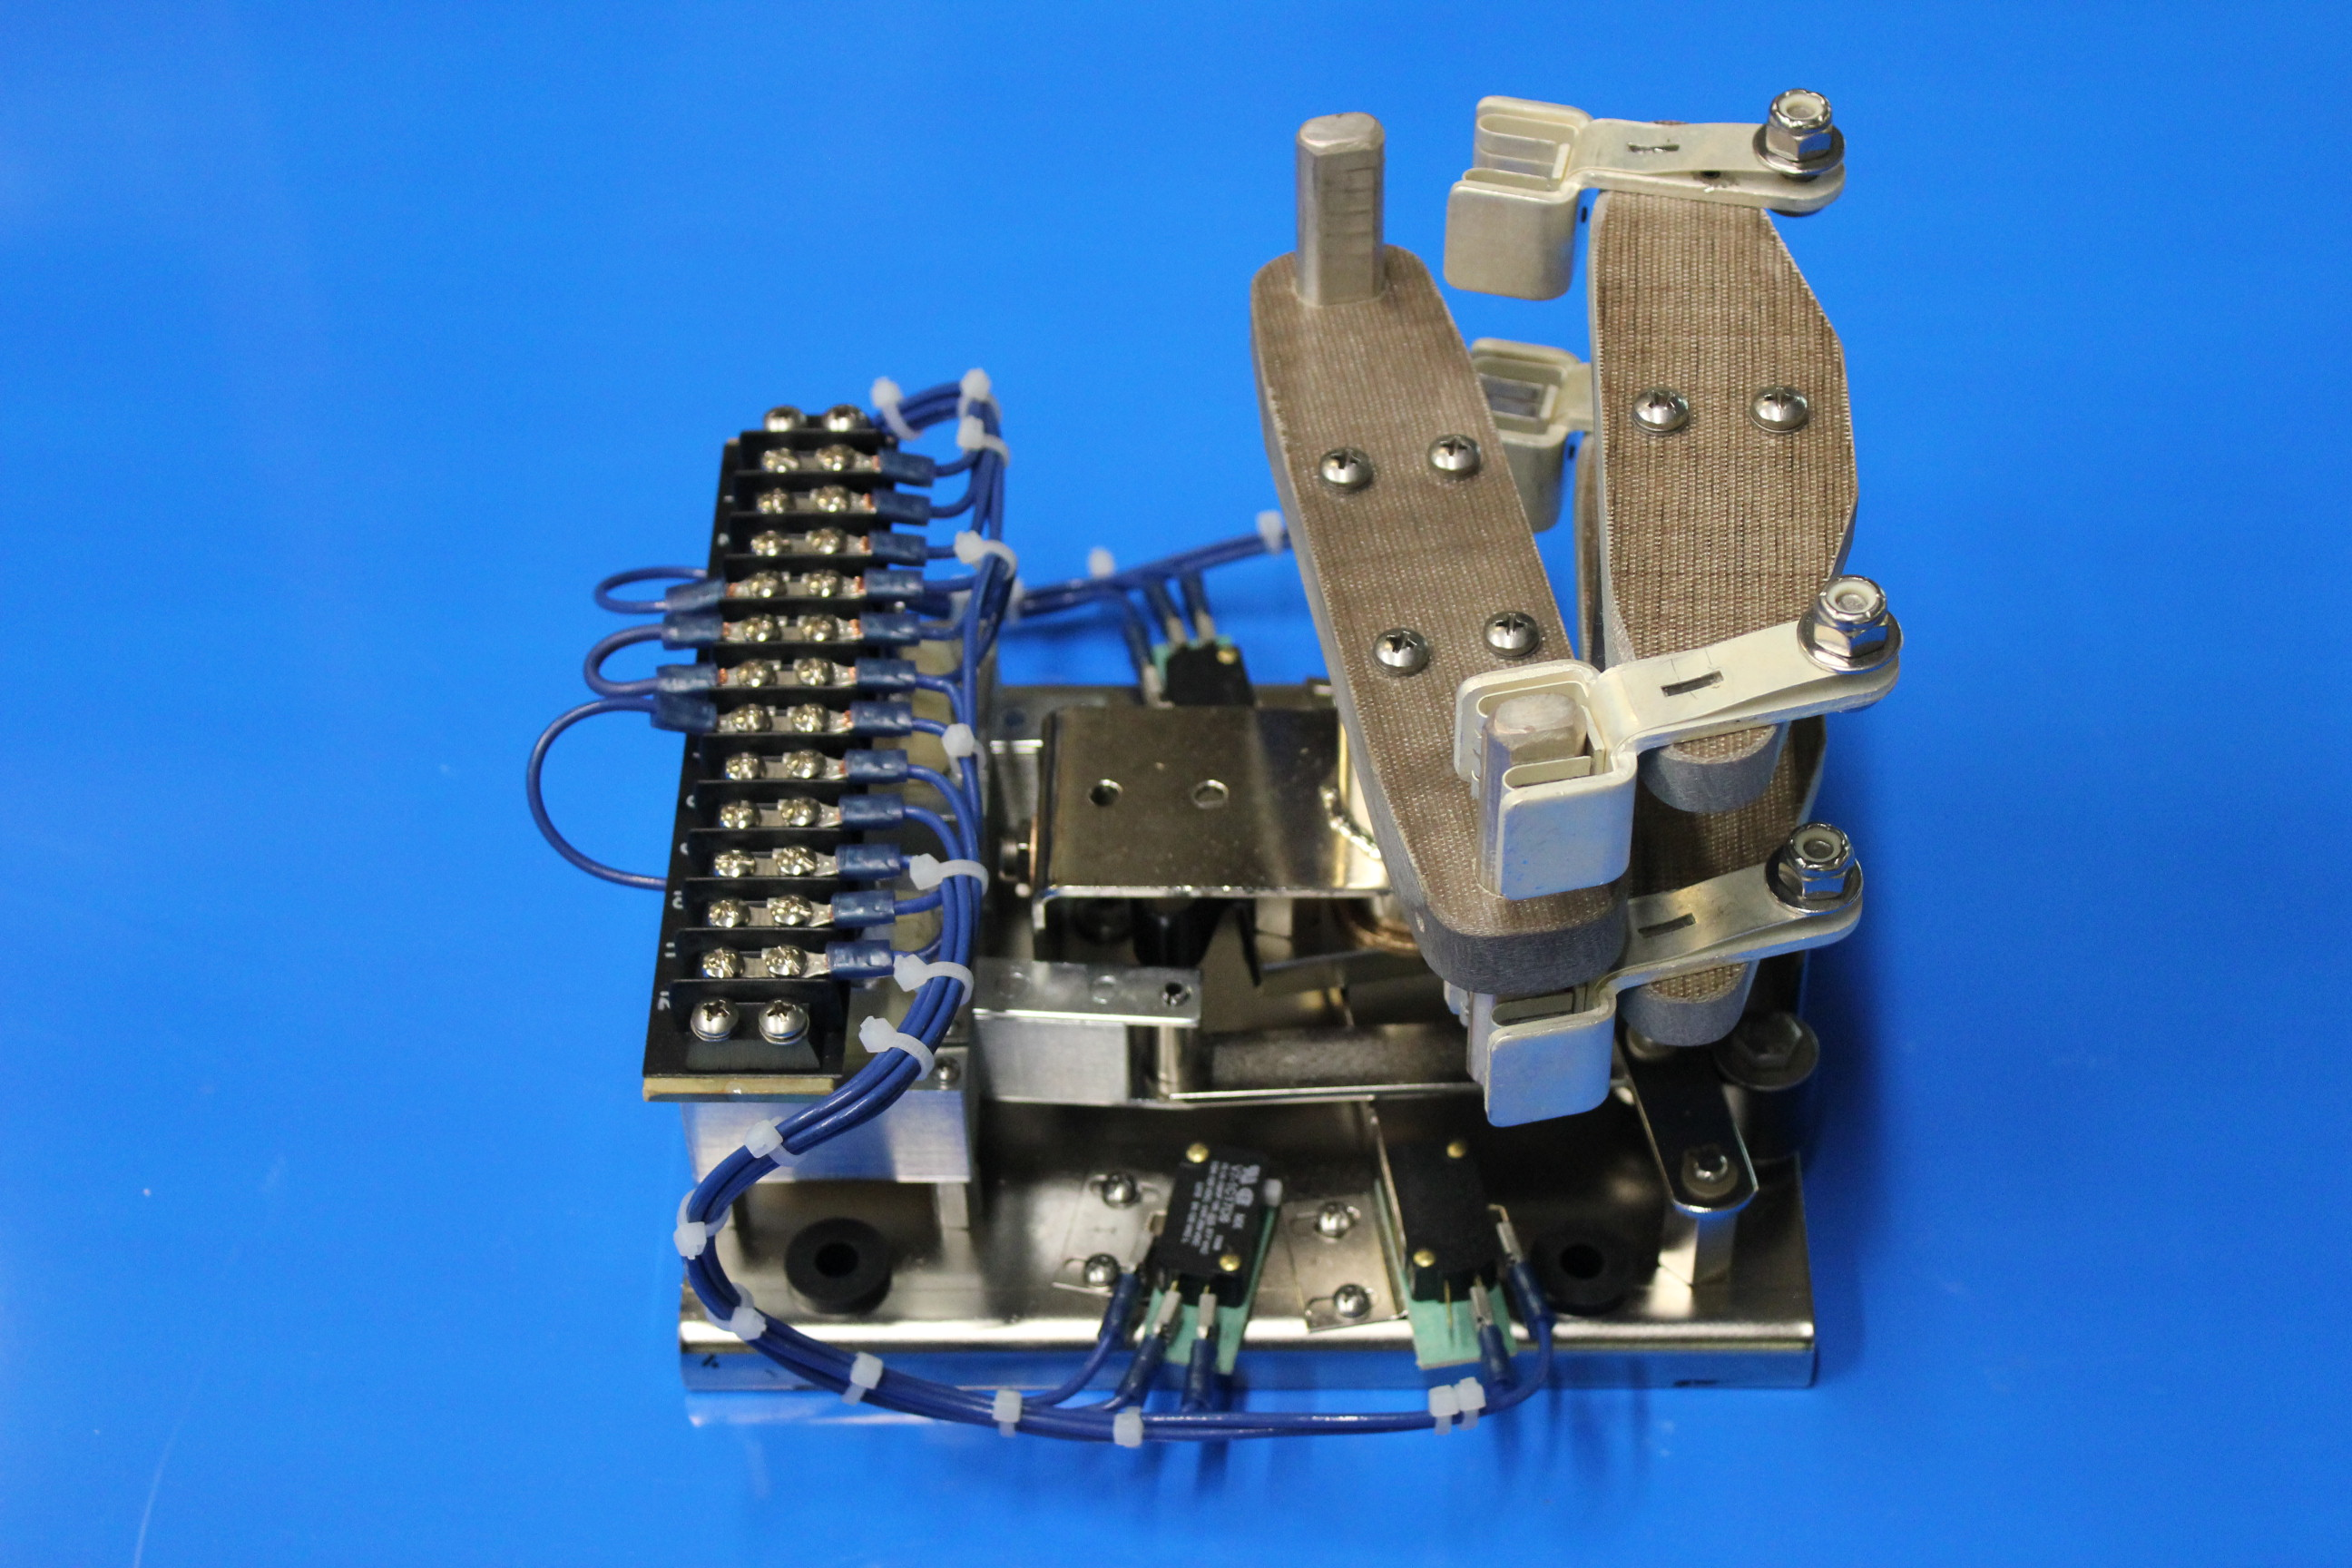 40 Amp Contactor Kintronic Laboratories Inc Wiring Diagram 220 Rfc 20 1